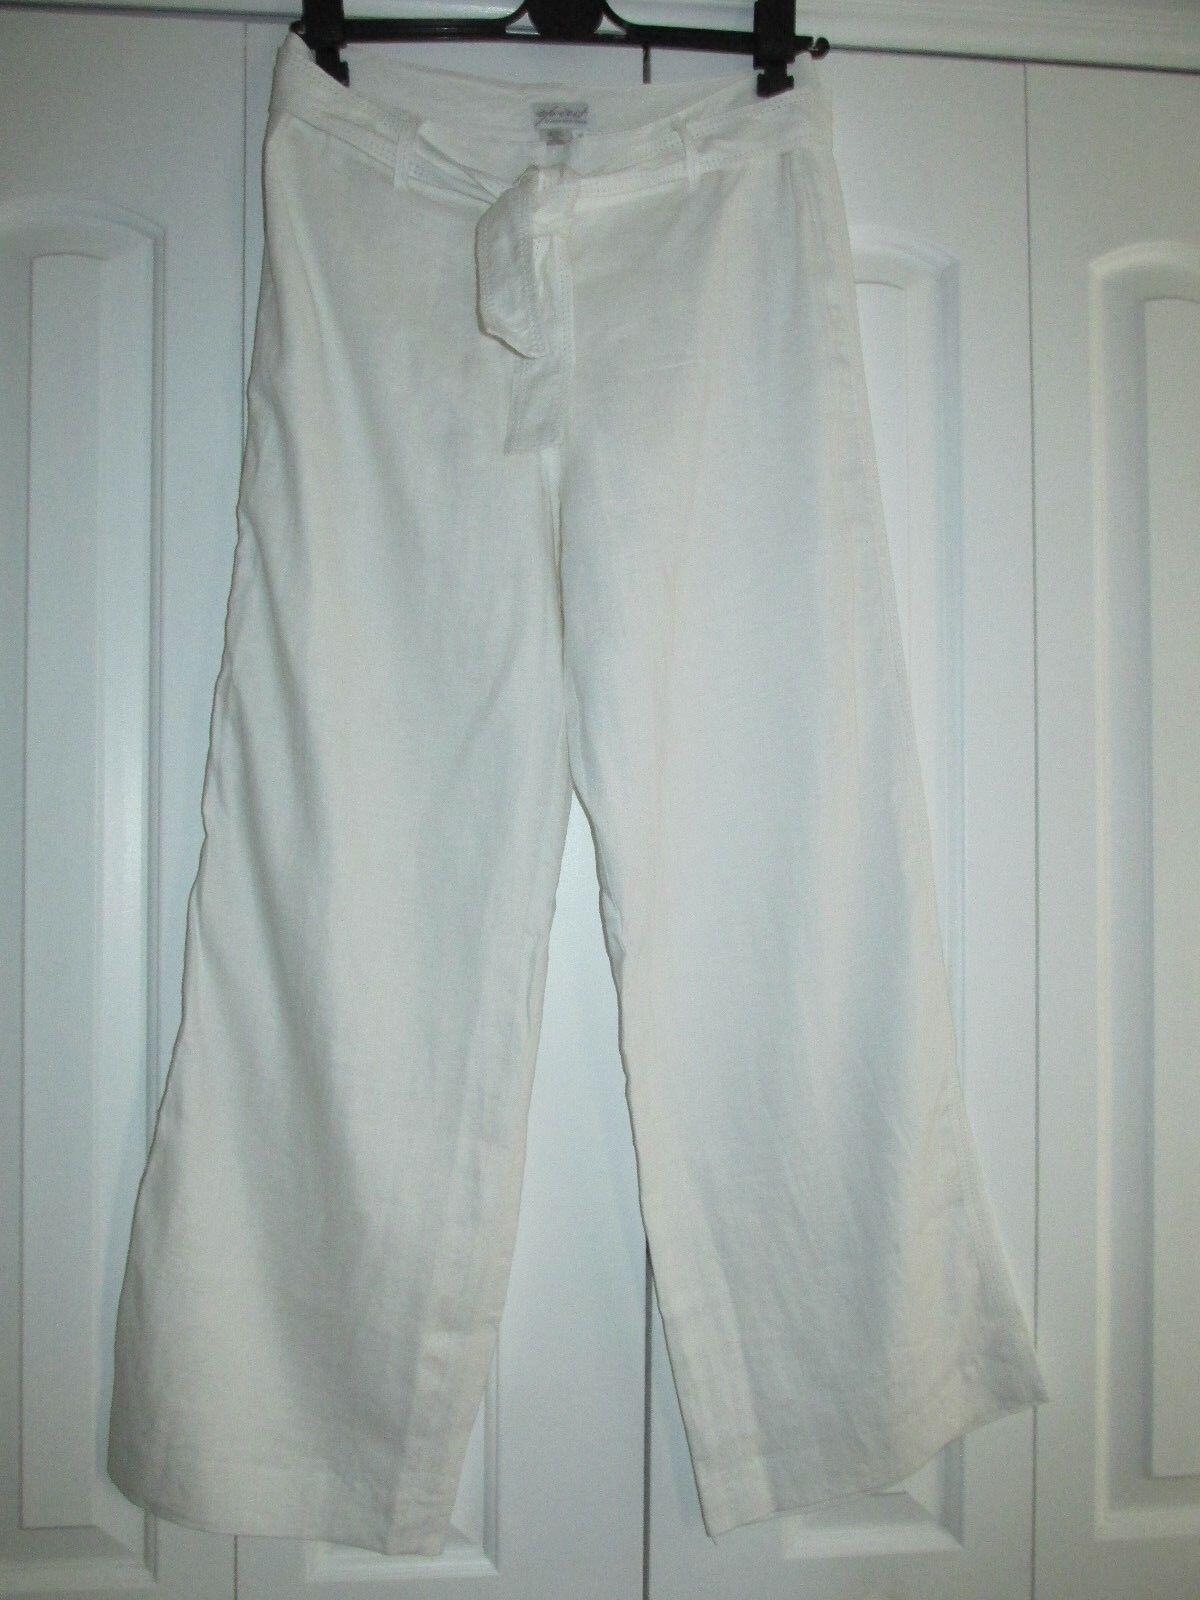 New Spirit by Coldwater Creek Size 10 Wide Leg Linen Pants